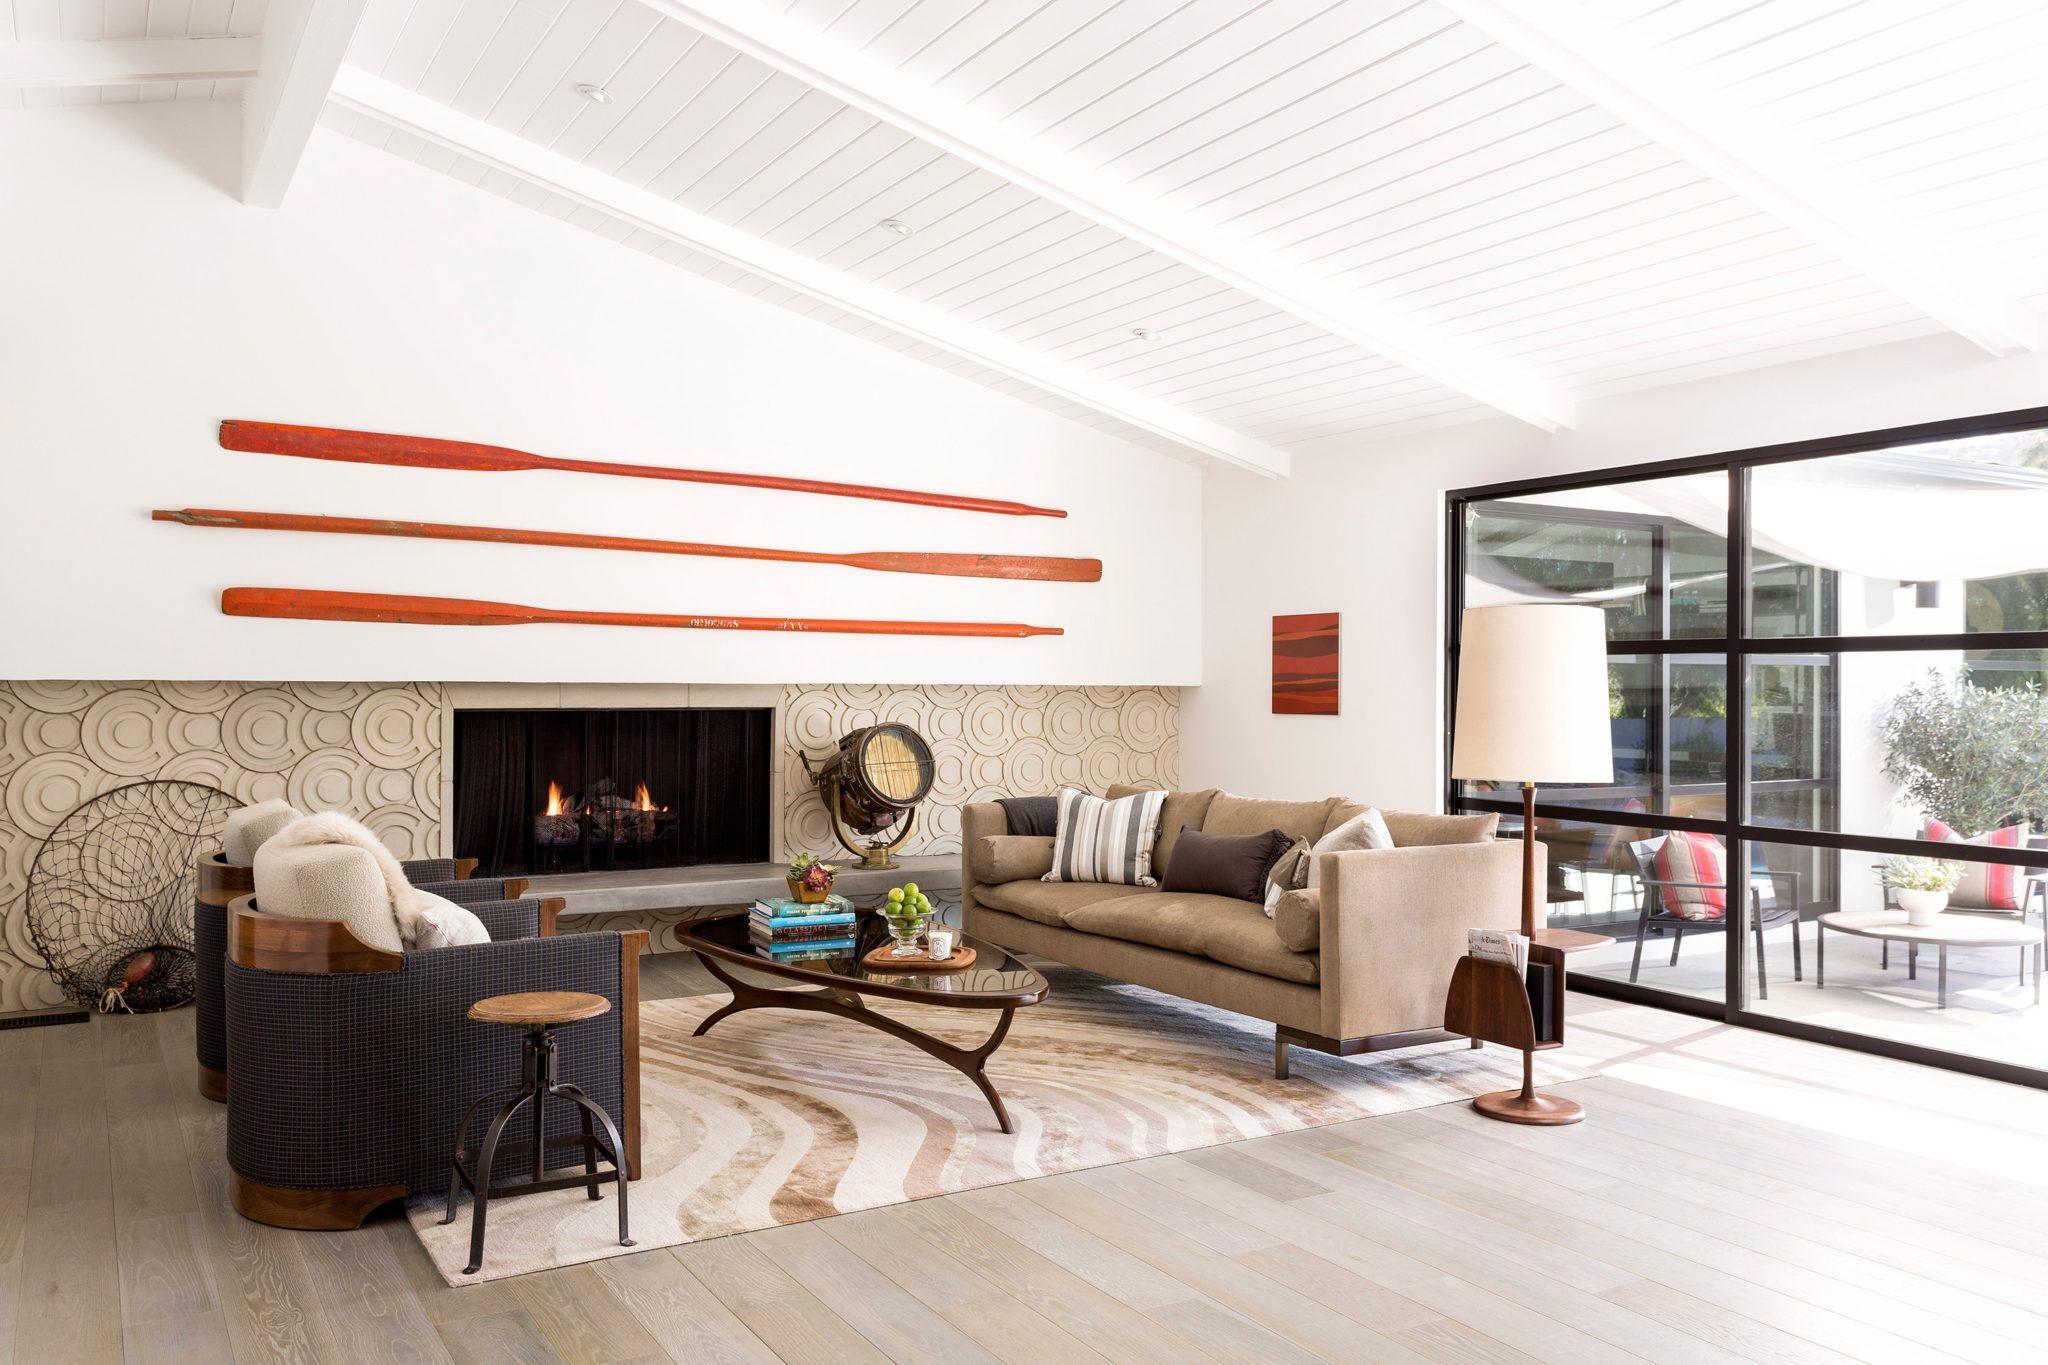 Interior design by Brown Design Group